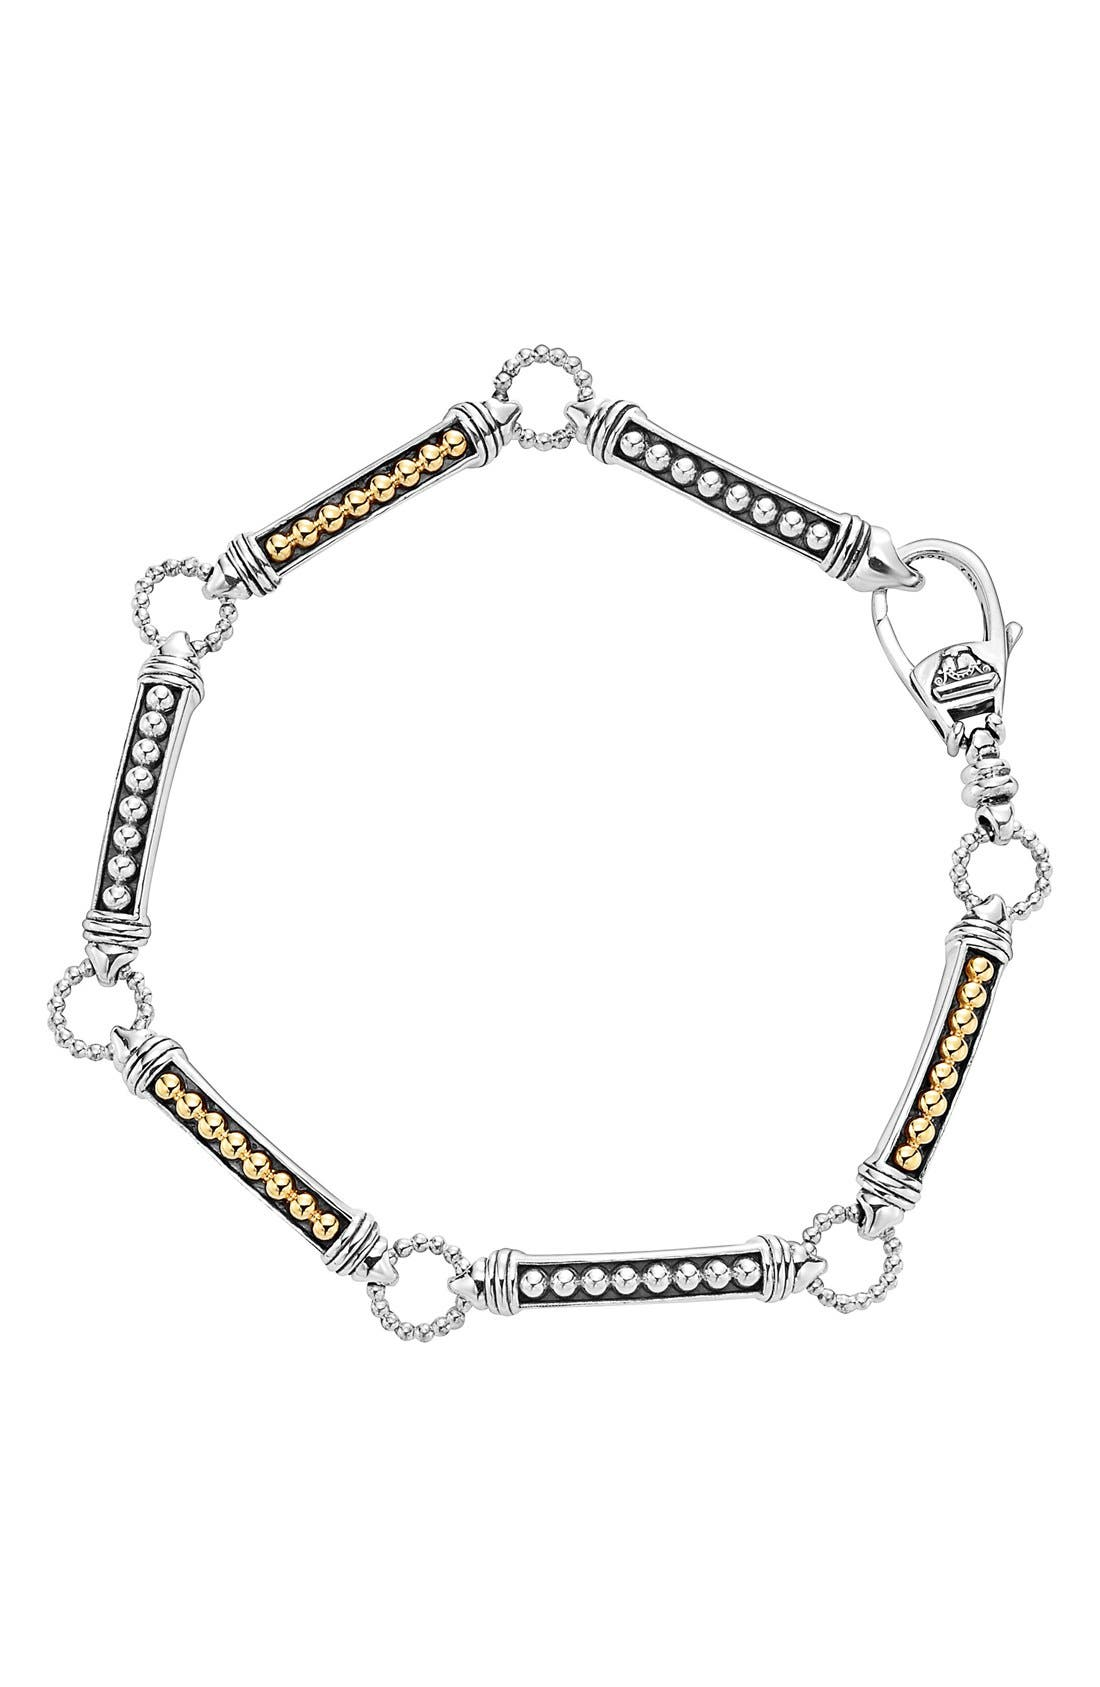 Caviar 'Superfine' Two-Tone Line Bracelet,                         Main,                         color, 040